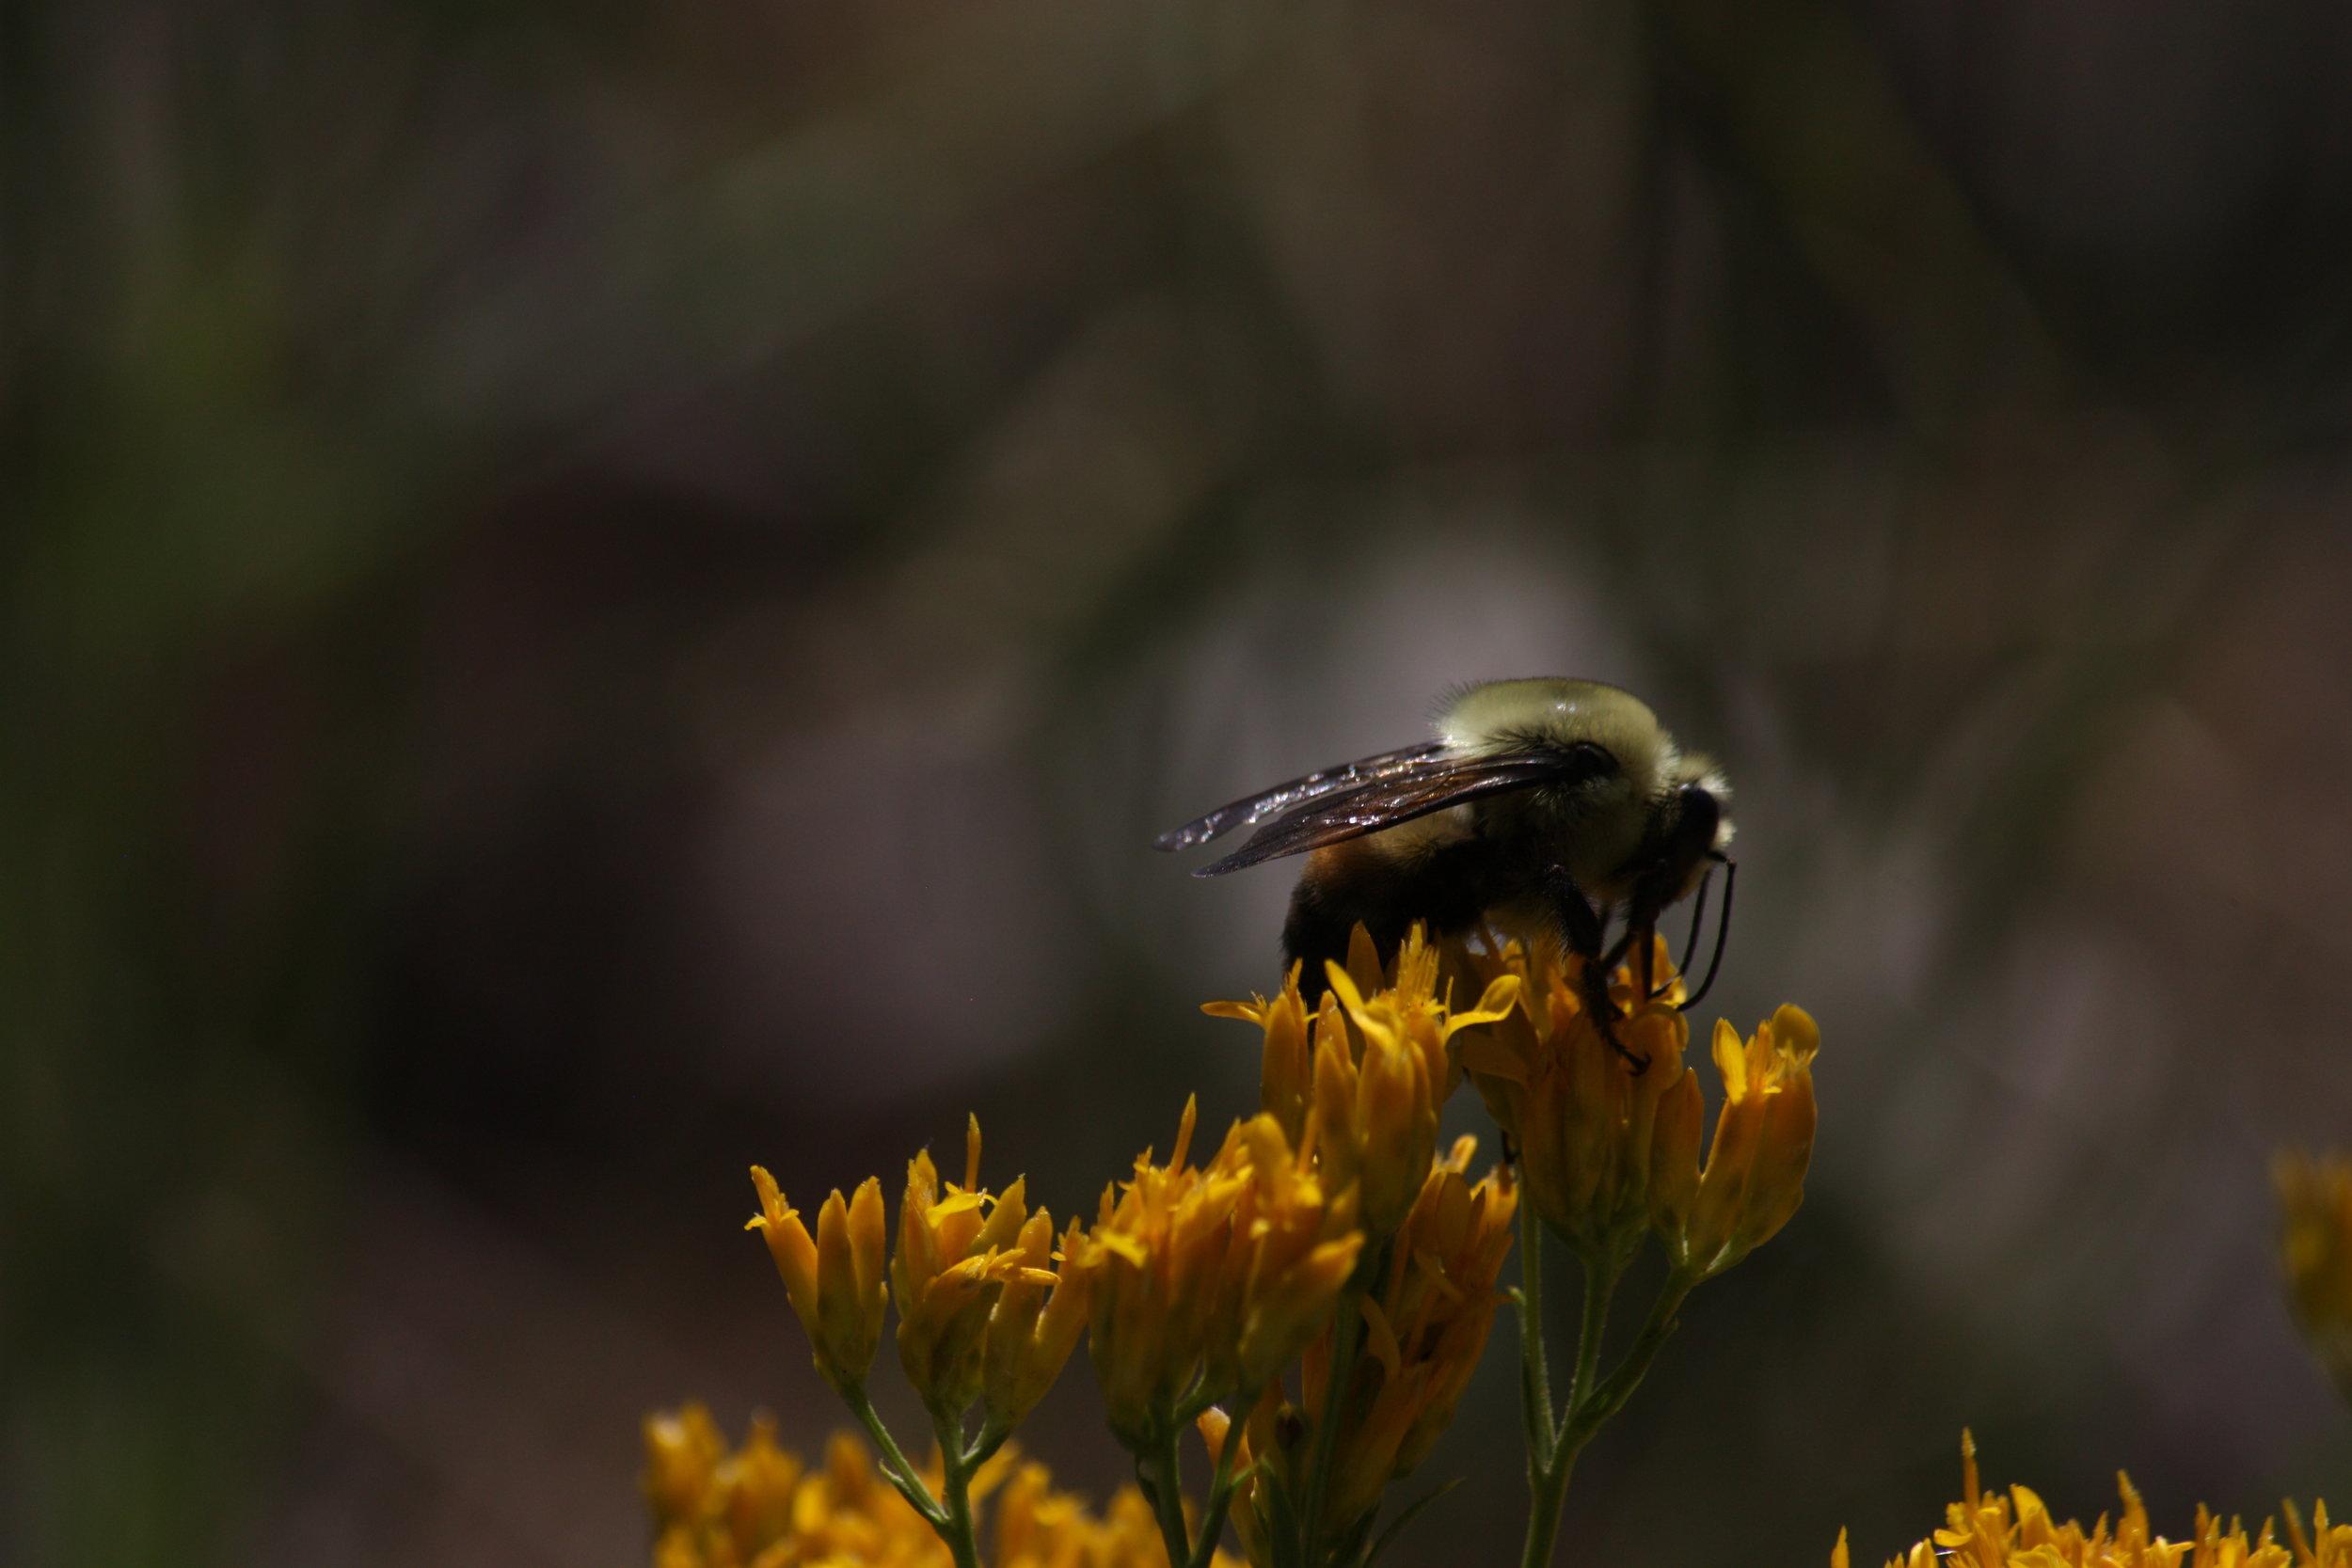 bumblebee-bombus-huntii_25454095964_o.jpg